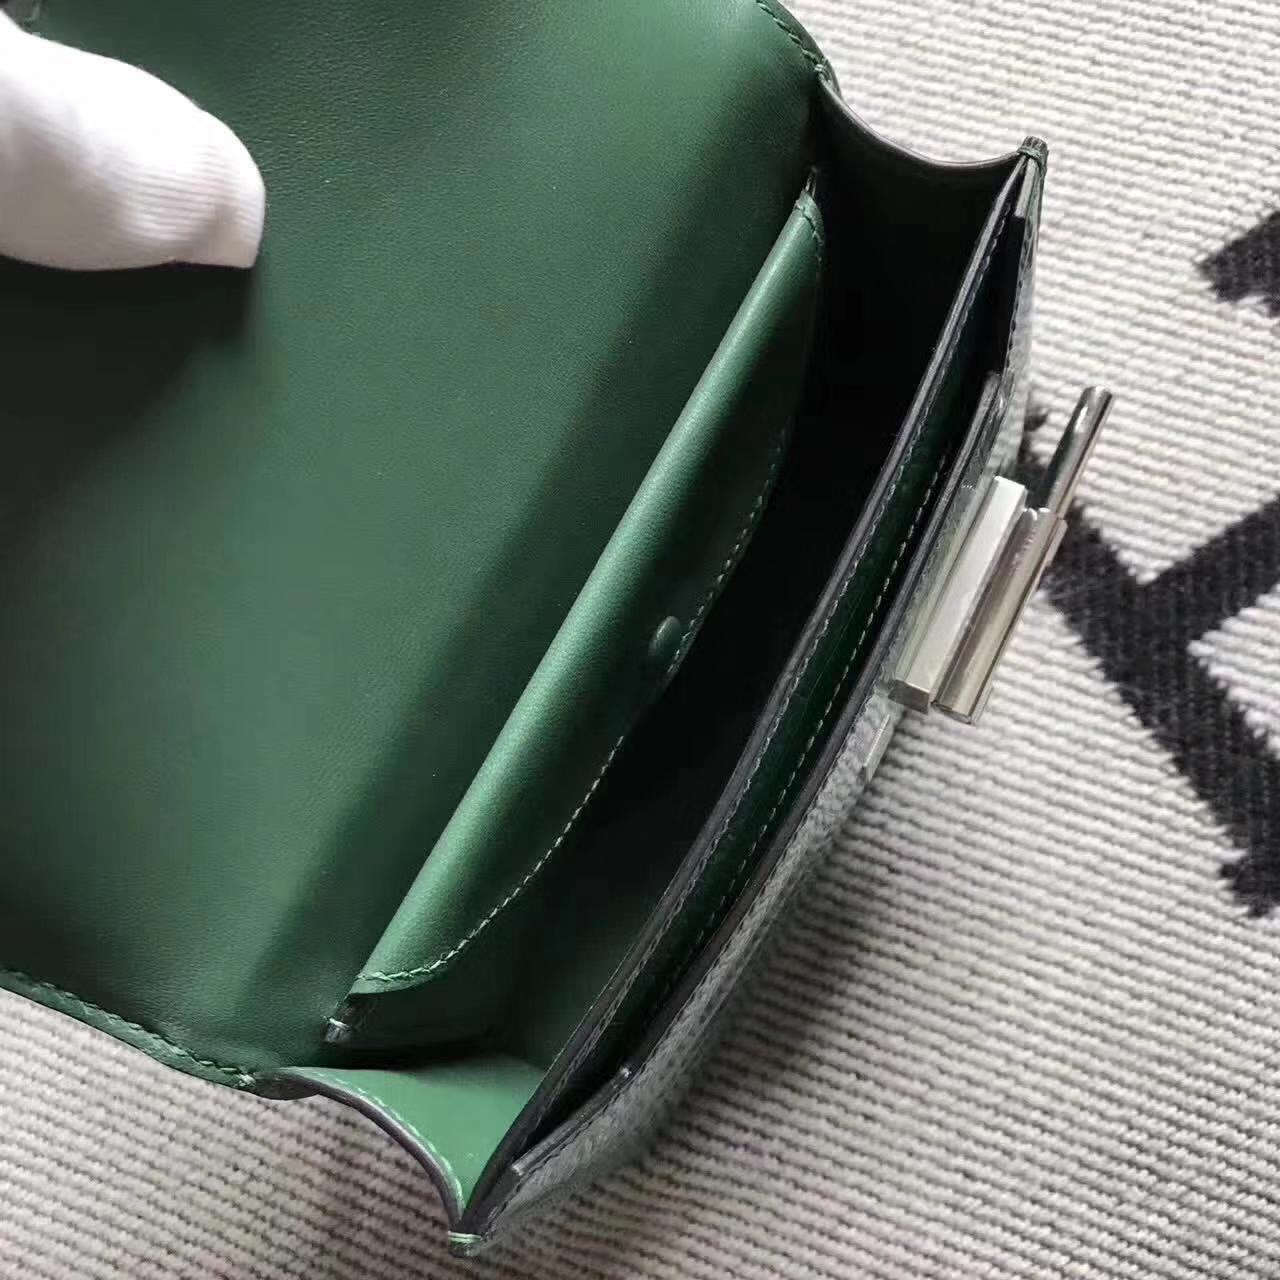 Wholesale Hermes Crocodile Shiny Leather VerrouBag in Green